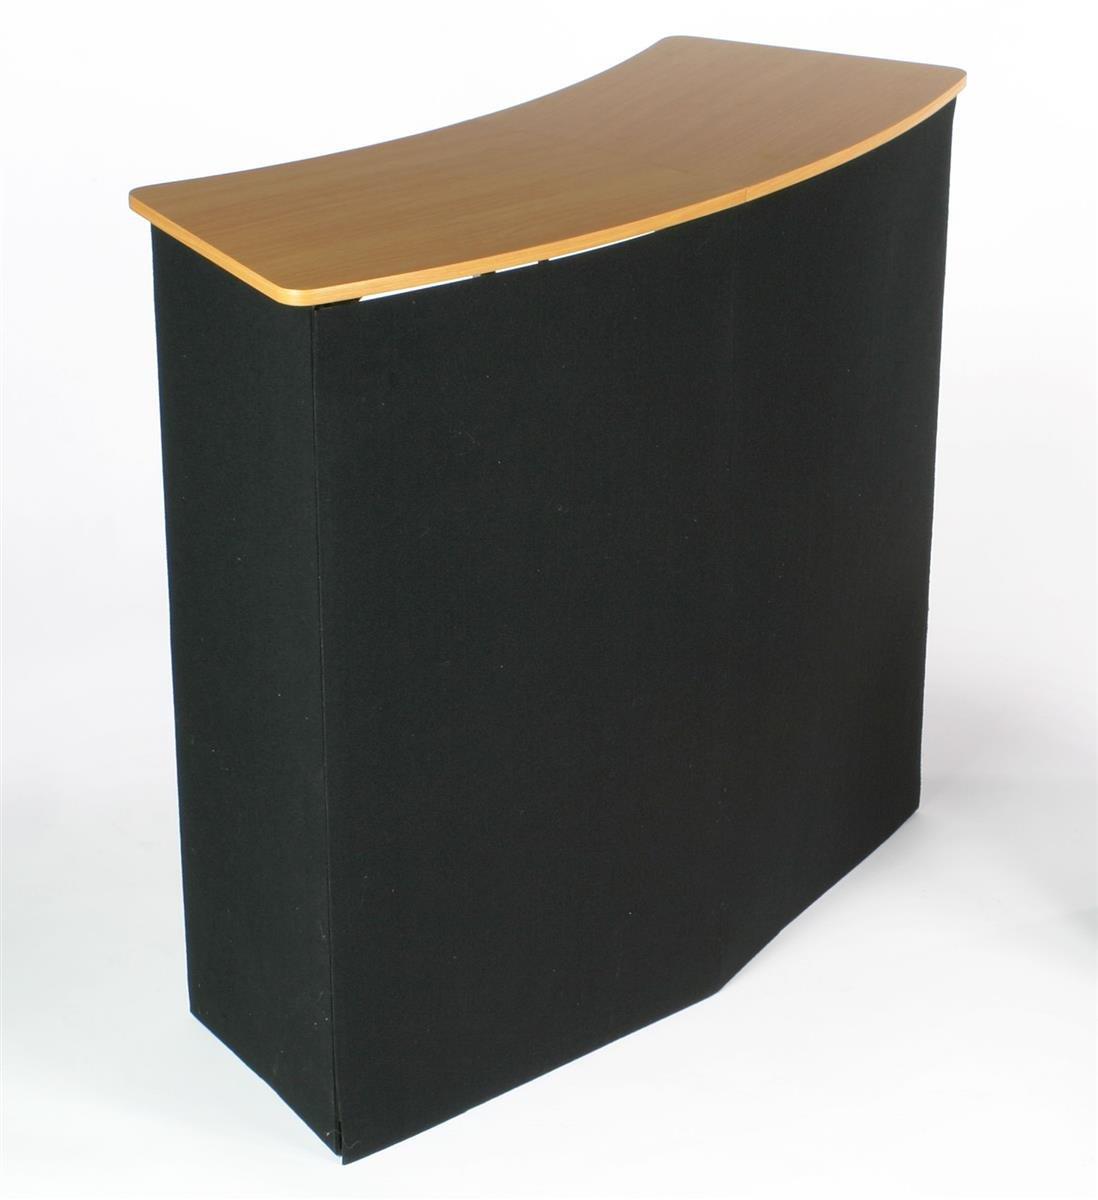 Displays2go Portable Trade Show Display Counter Kiosk with Pop-Up Design, 3.5-Feet Wide, Black Velcro-Receptive Fabric (CNTPUVLBLK)